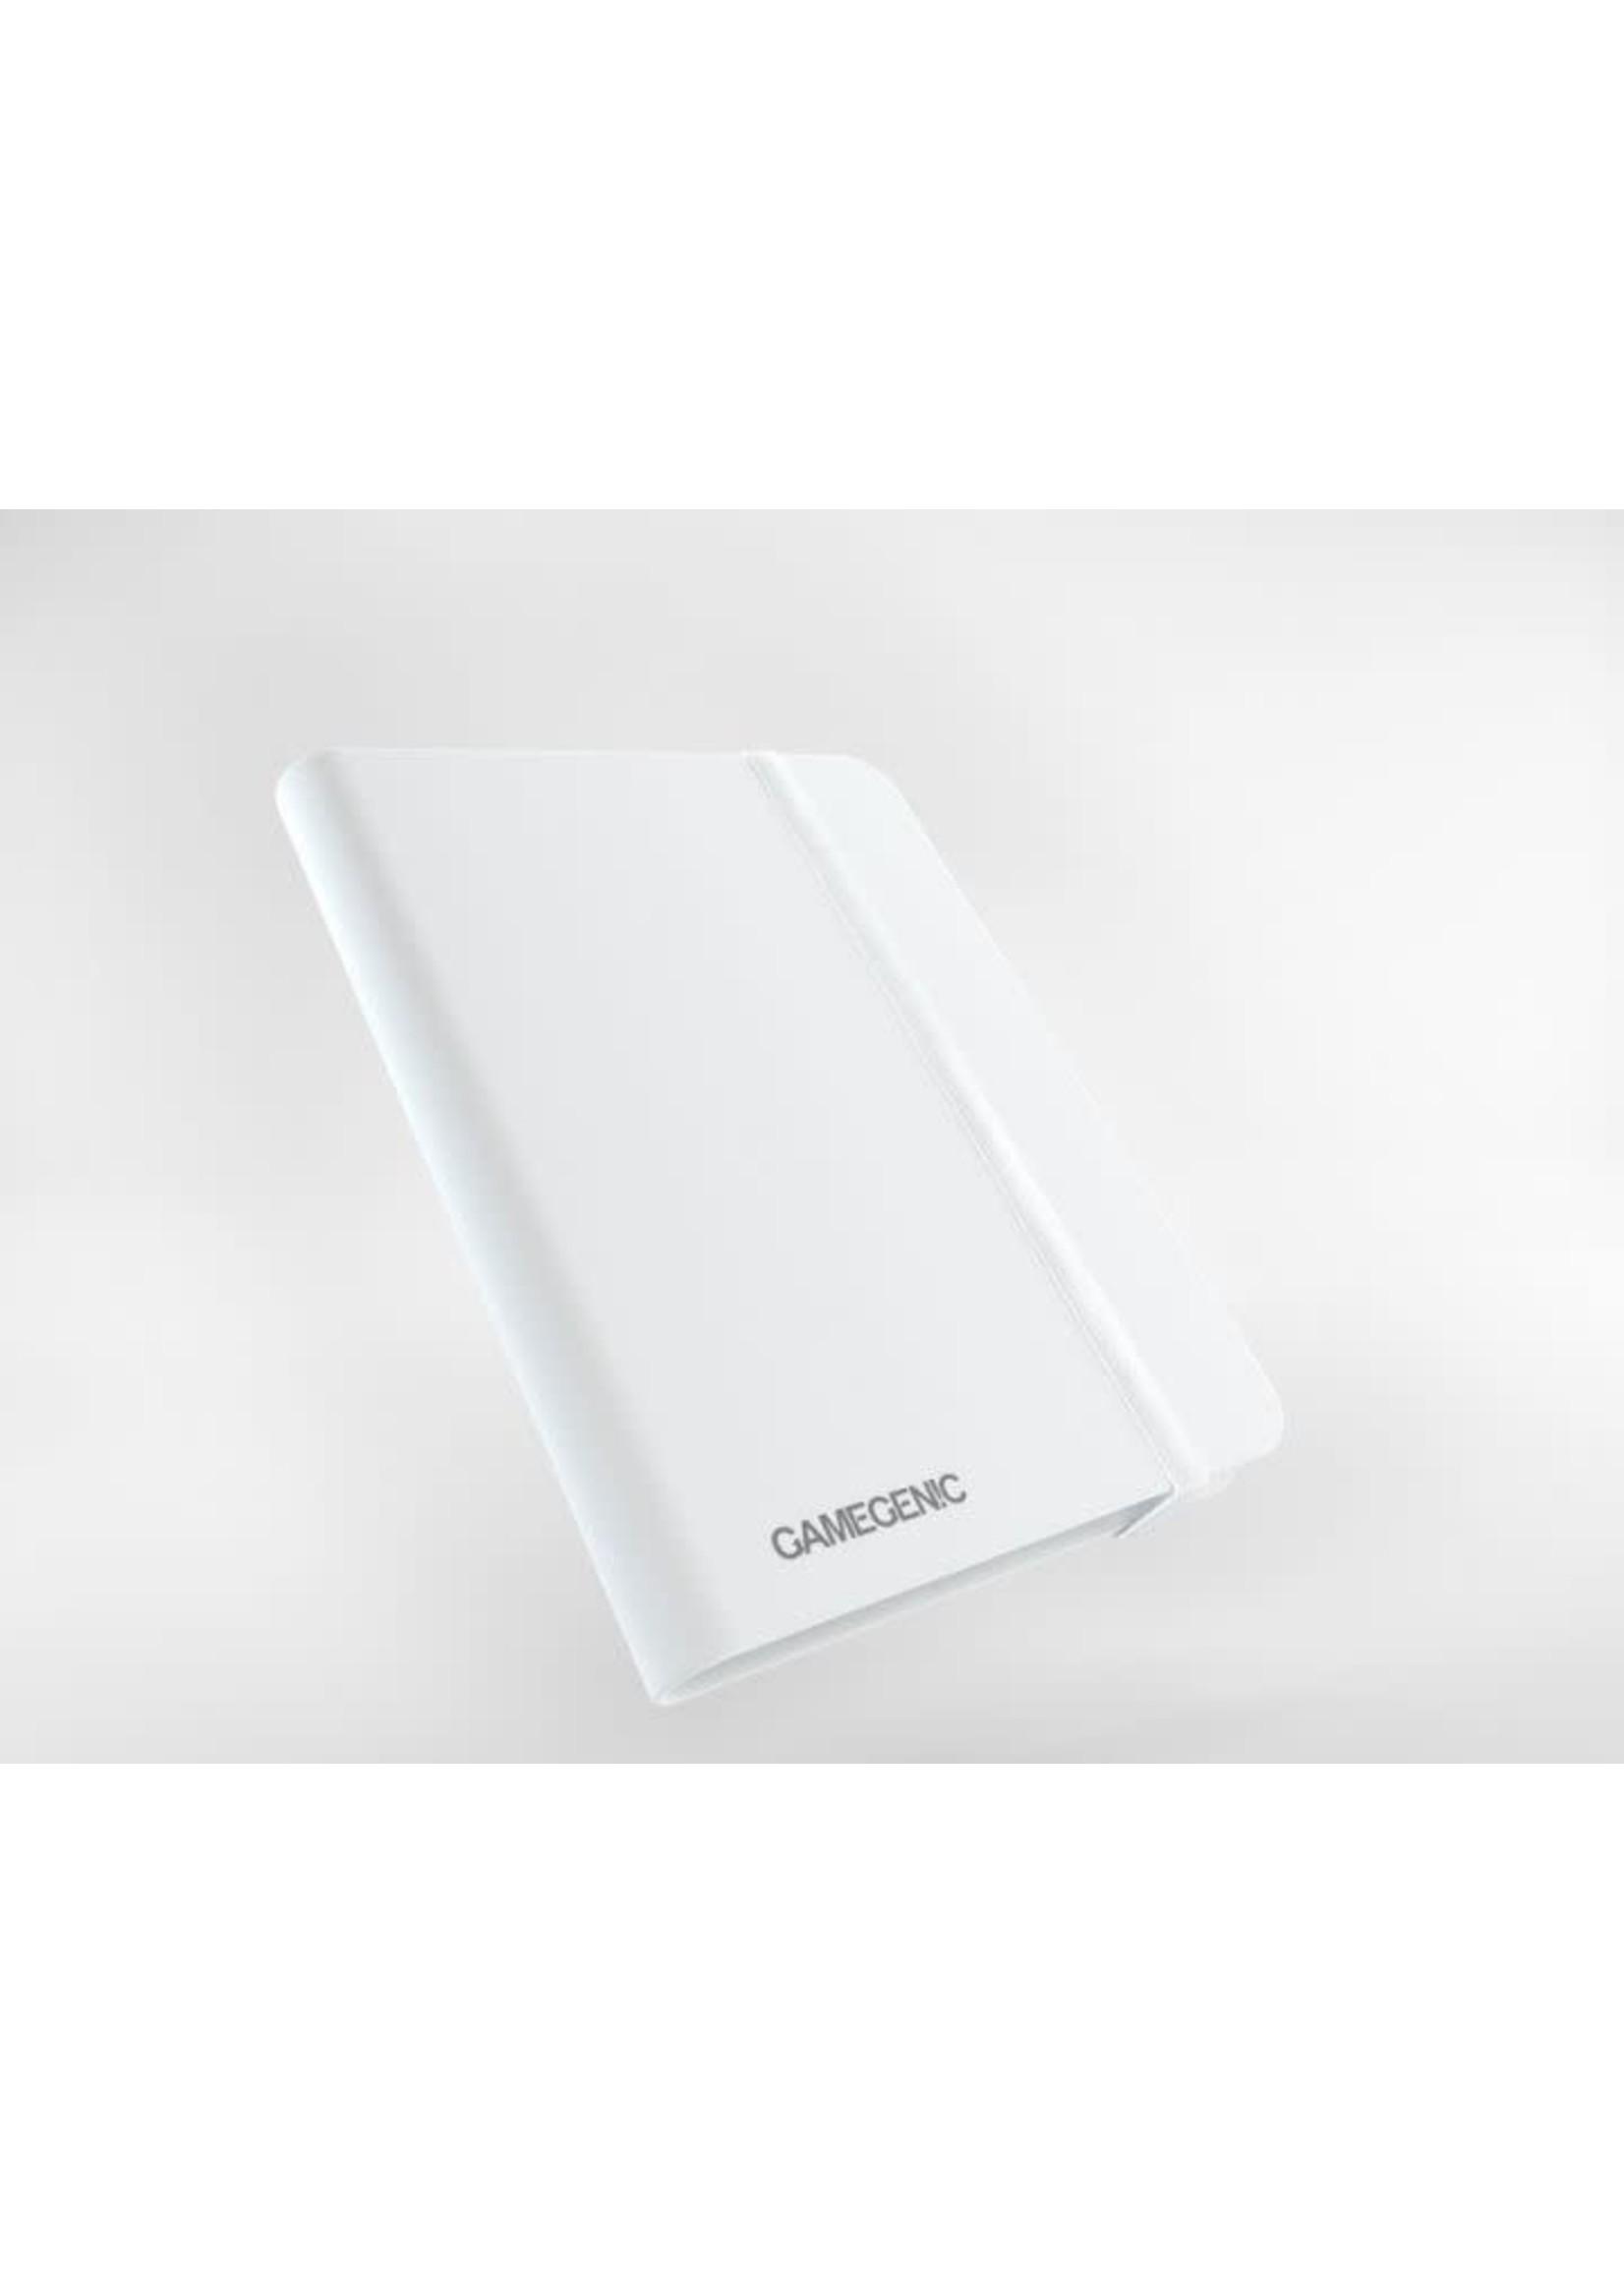 Gamegenic - Casual Album 8-Pocket White